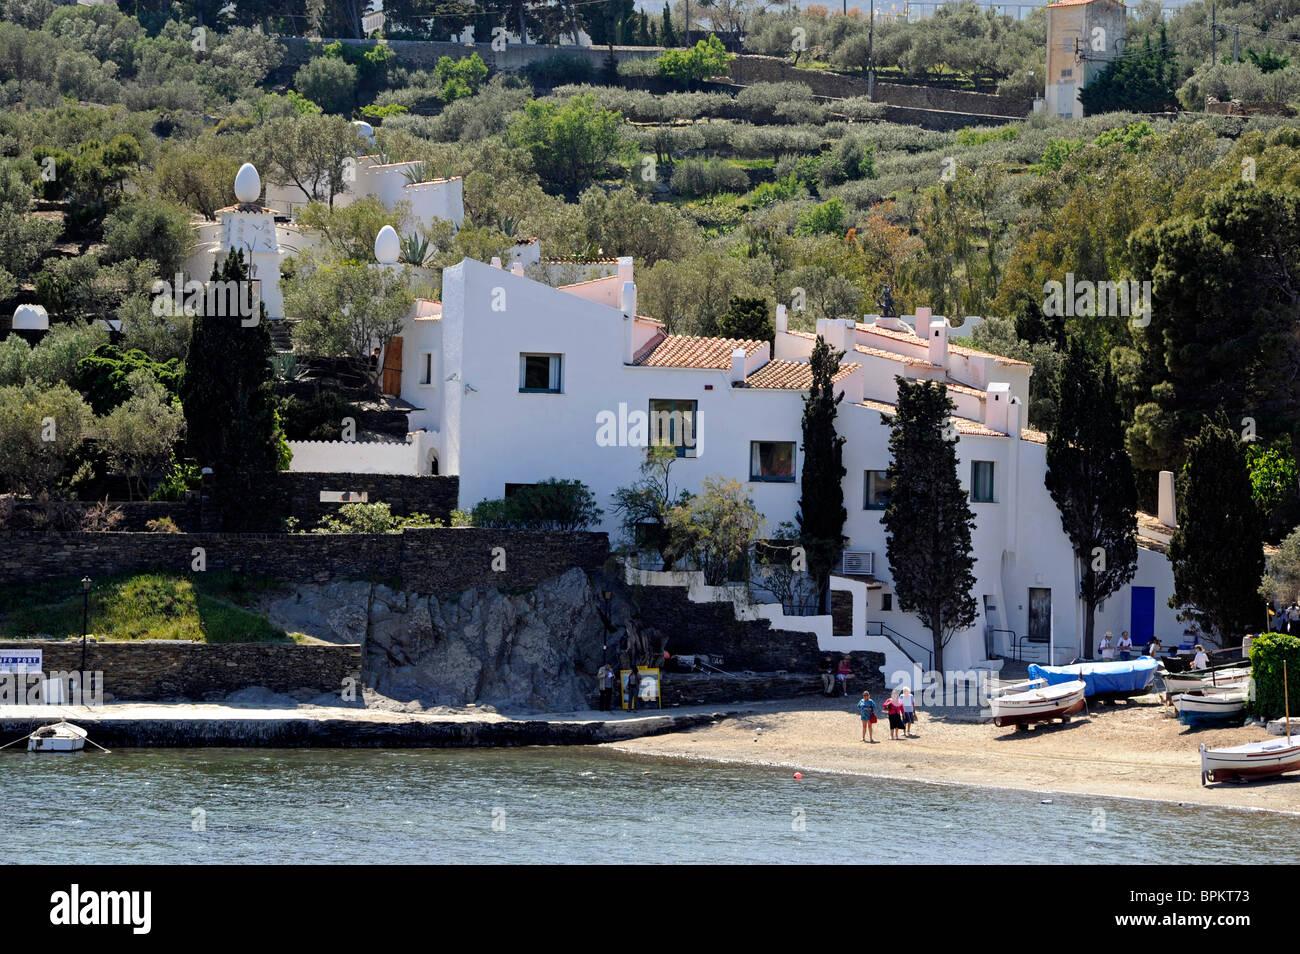 Salvador Dali House Museum In Port Lligat Near Cadaques Immagini E Fotos Stock Alamy